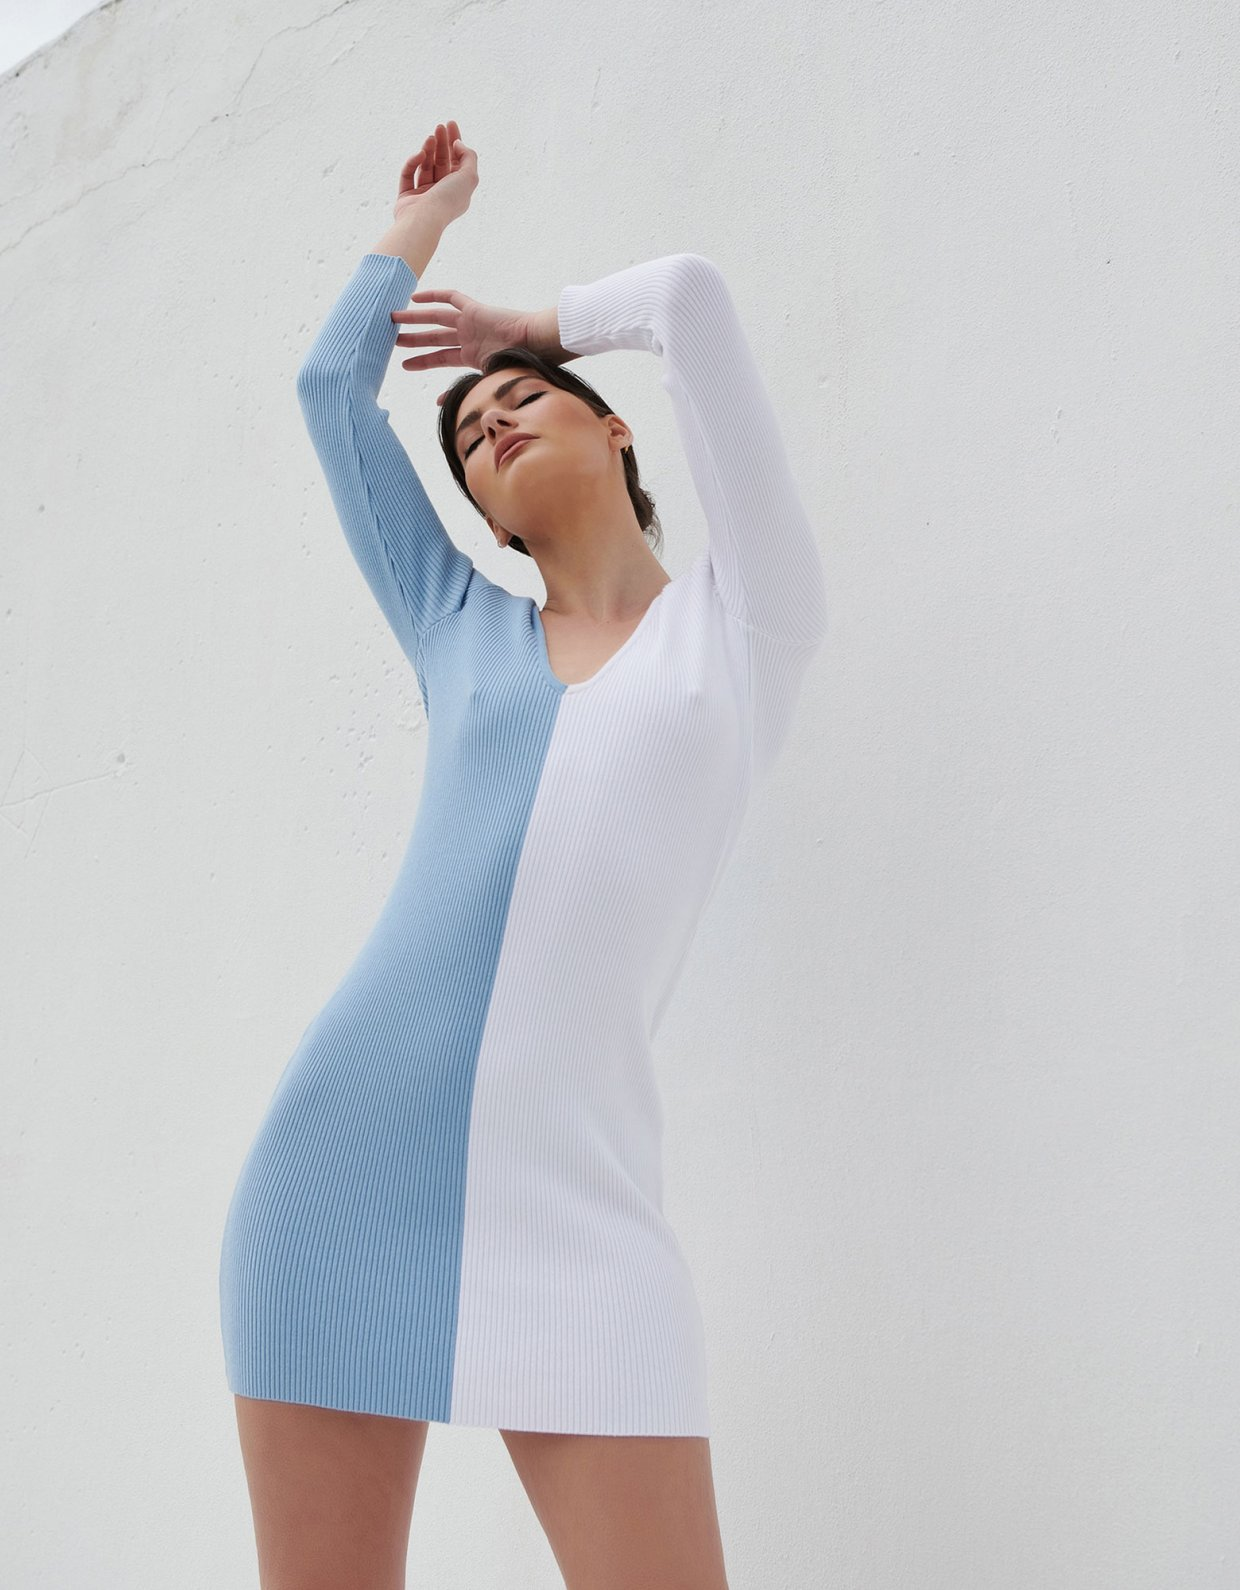 Combos Knitwear Combos S19 – Light blue/white dress